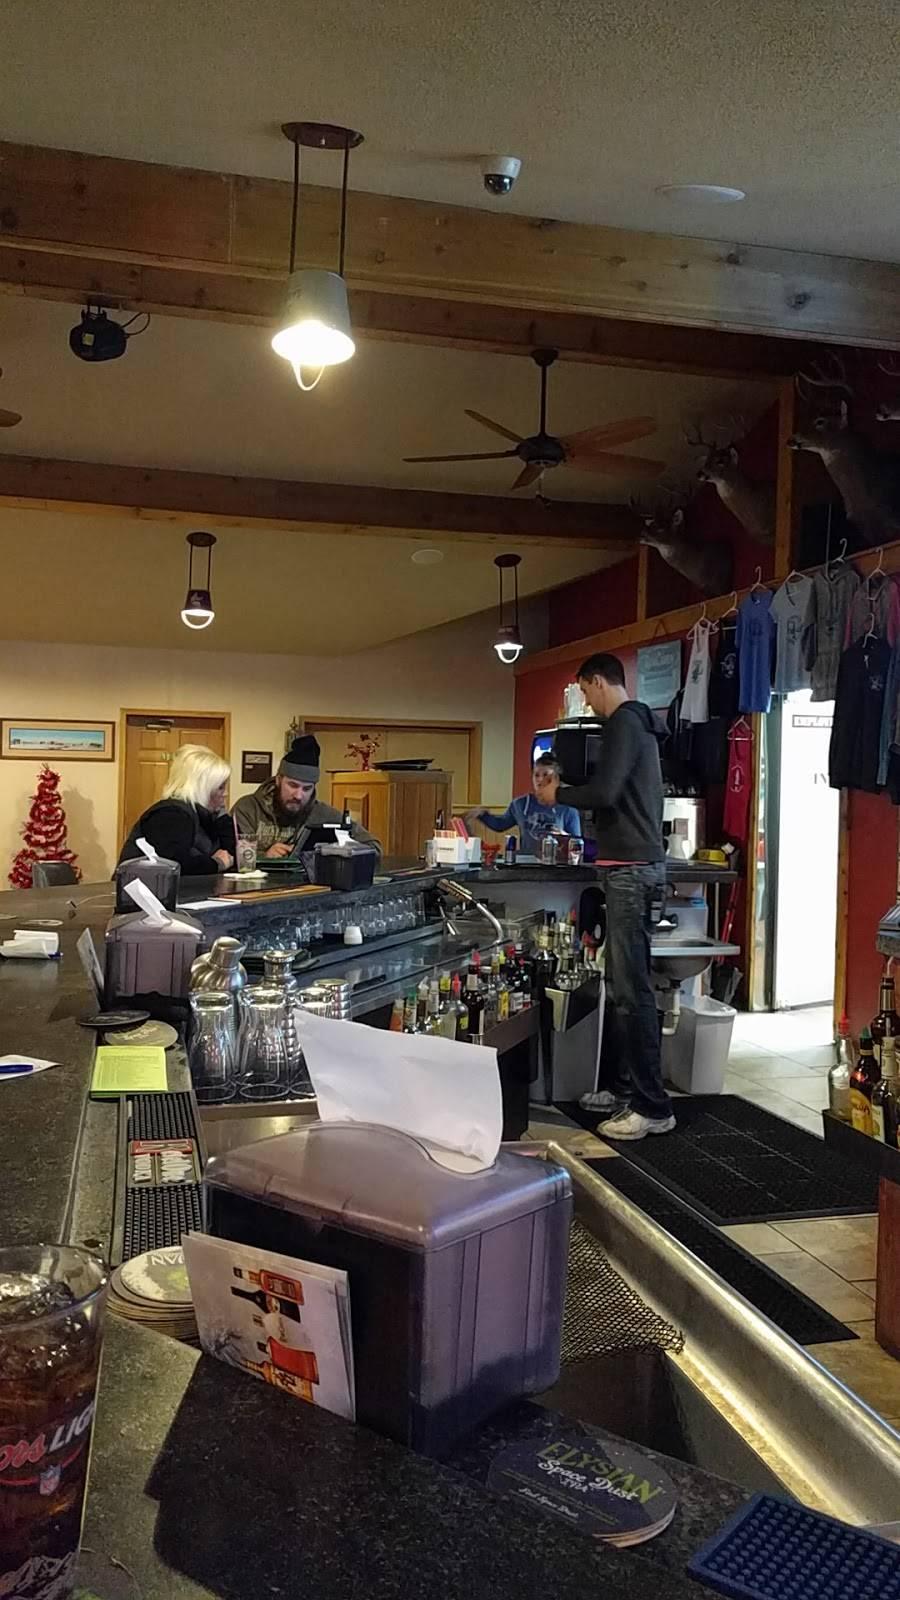 The Hub Supper Club | restaurant | 30905 Co Rd 13, Burtrum, MN 56318, USA | 3202854318 OR +1 320-285-4318